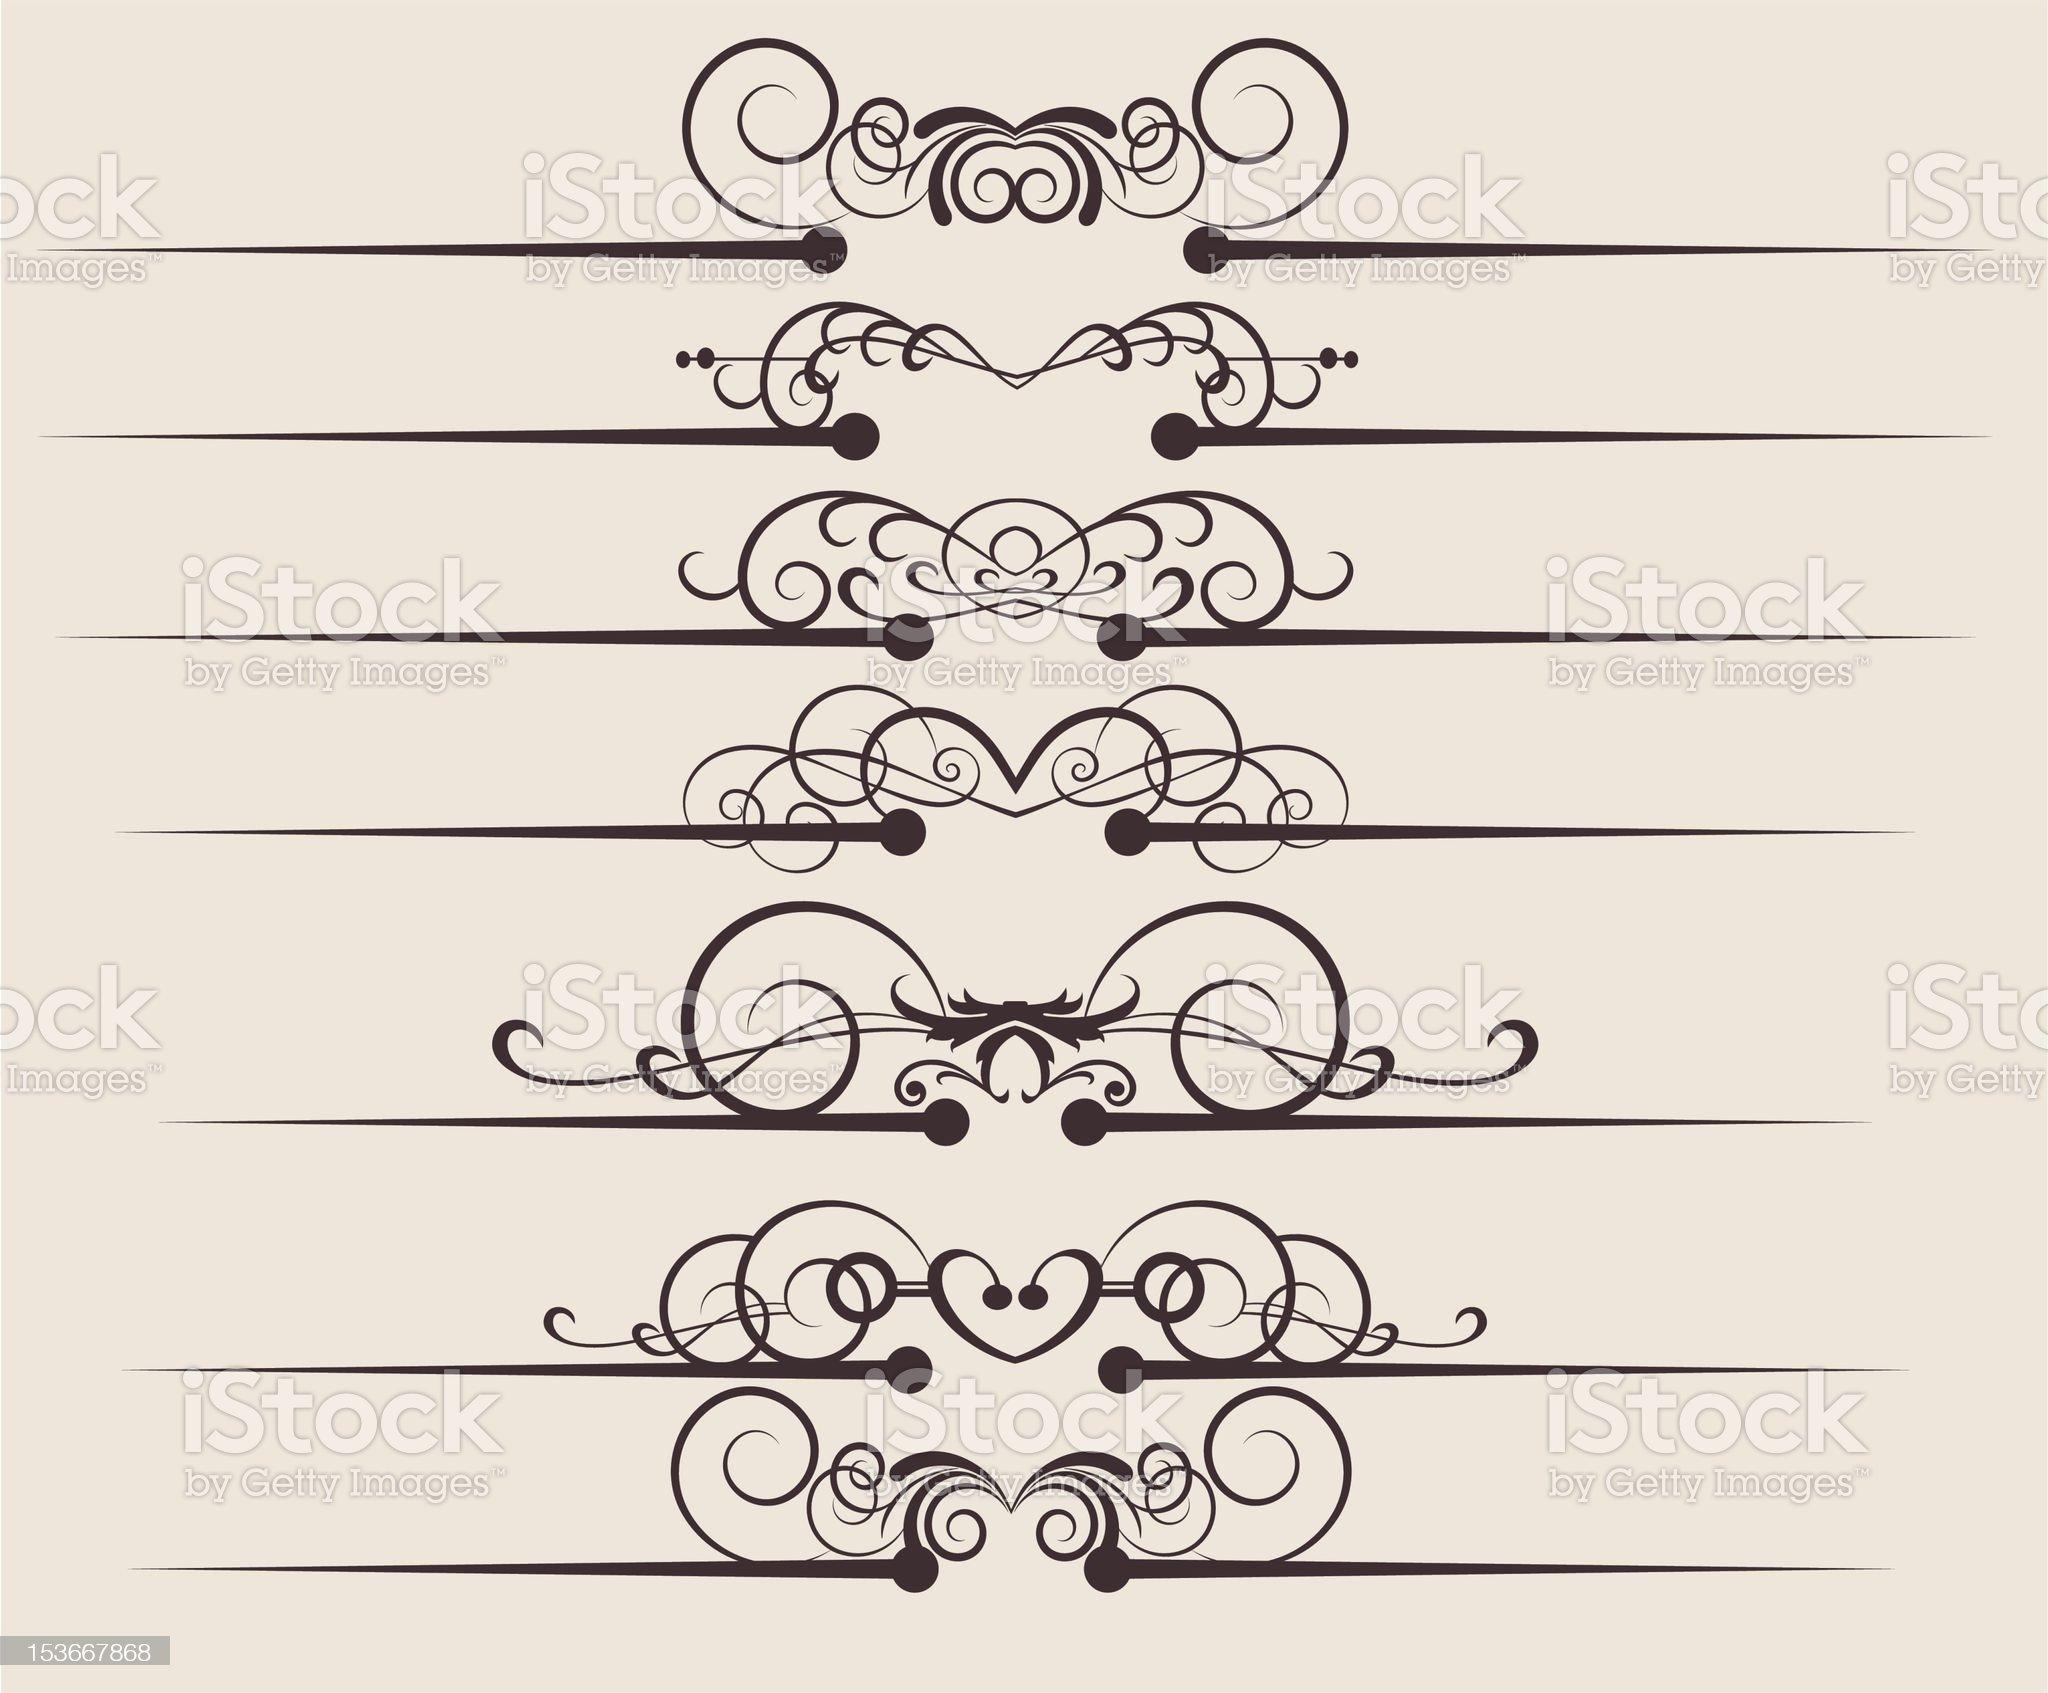 Design Dividers Vector image - Set 54 royalty-free stock vector art